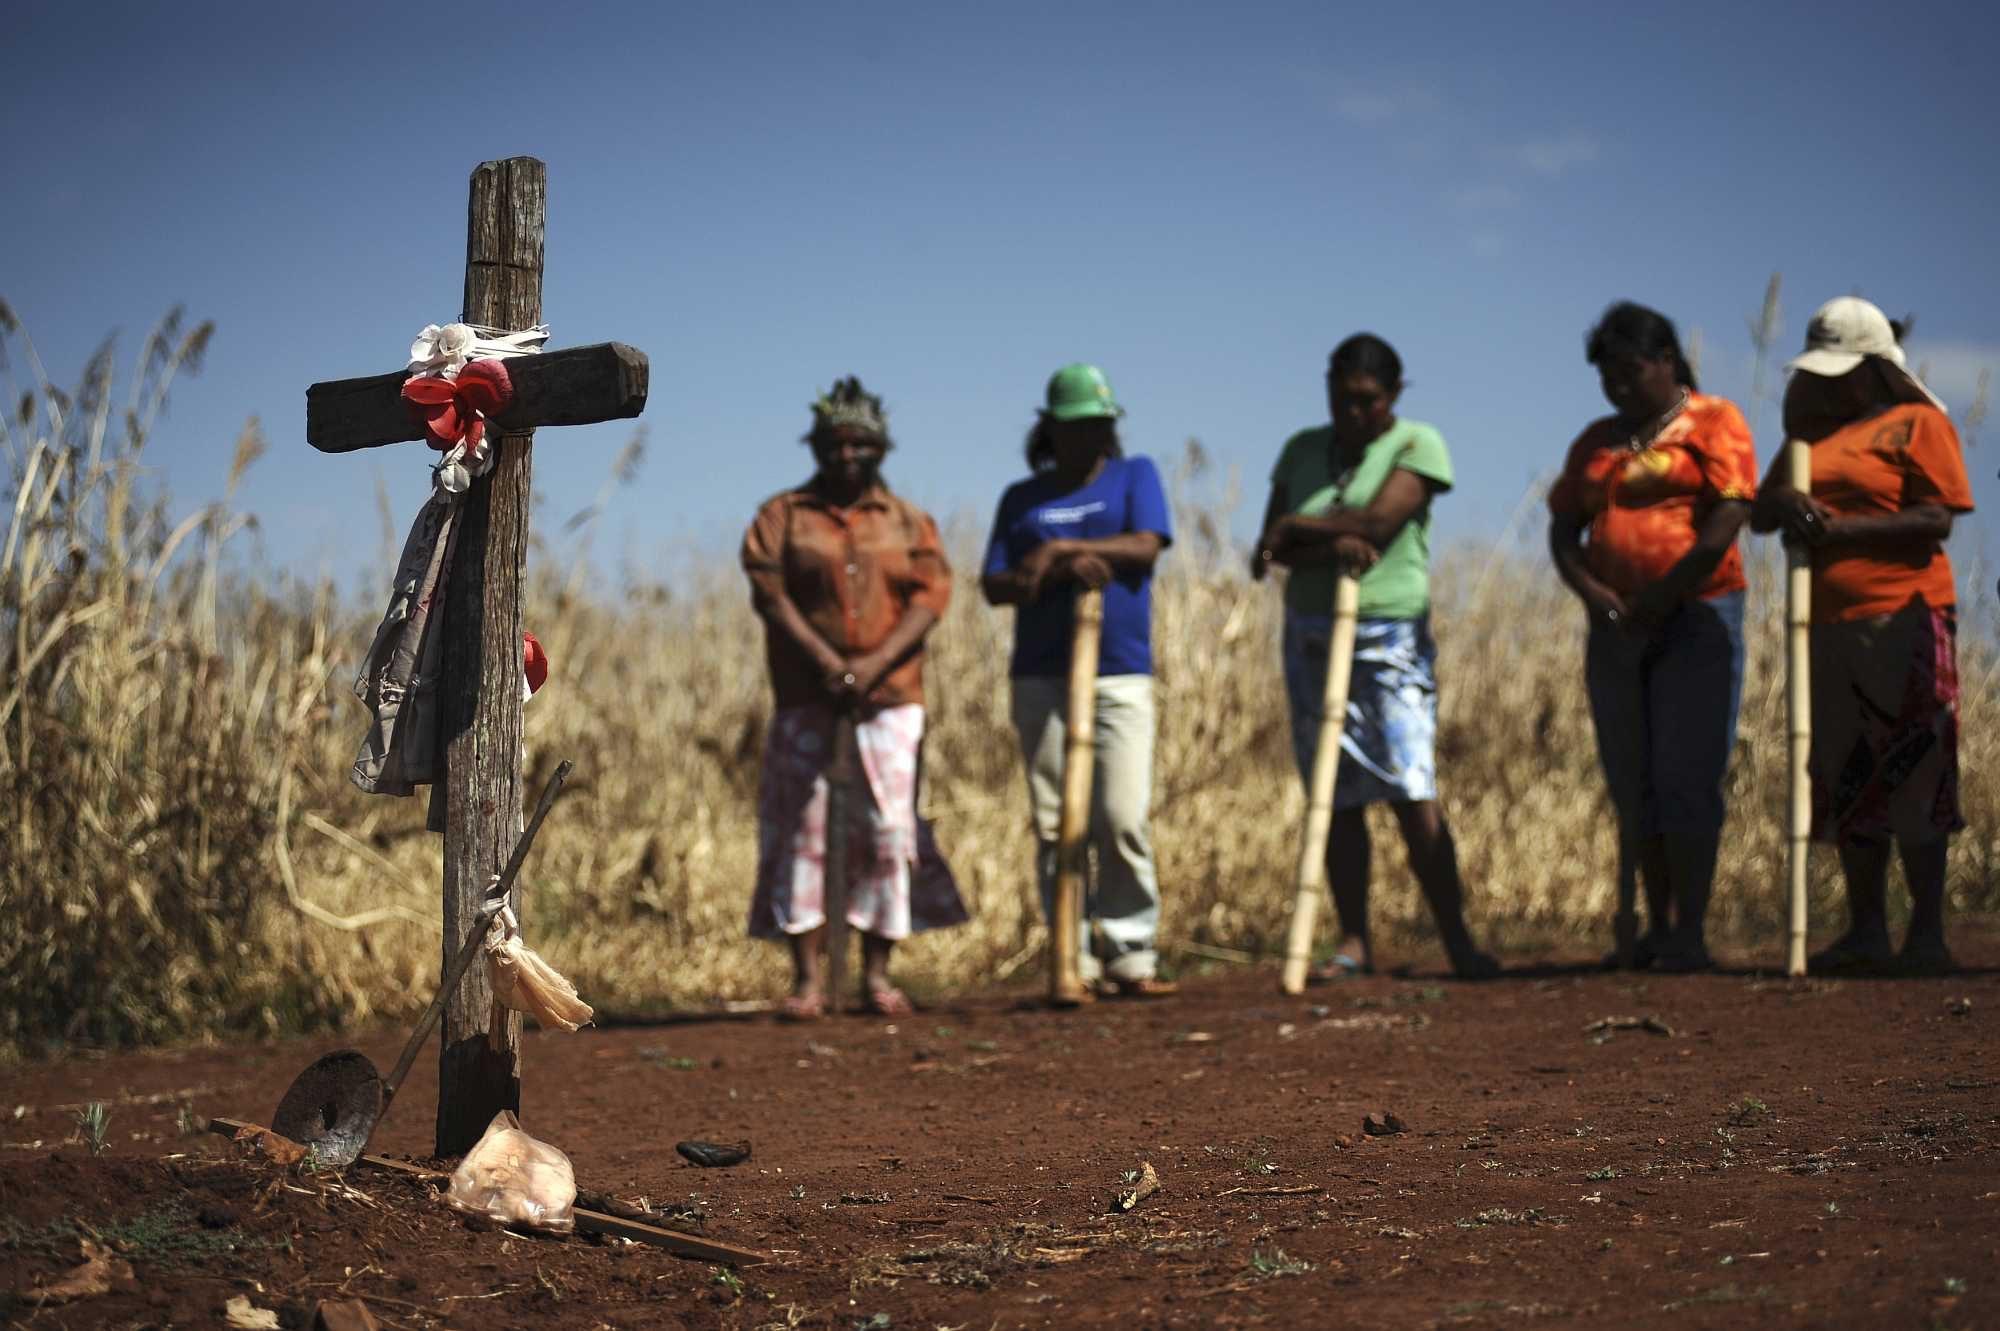 Guarani Kaiowá Indians gather for a fellow Indian killed by a farmer - Lunae Parracho/Reuters